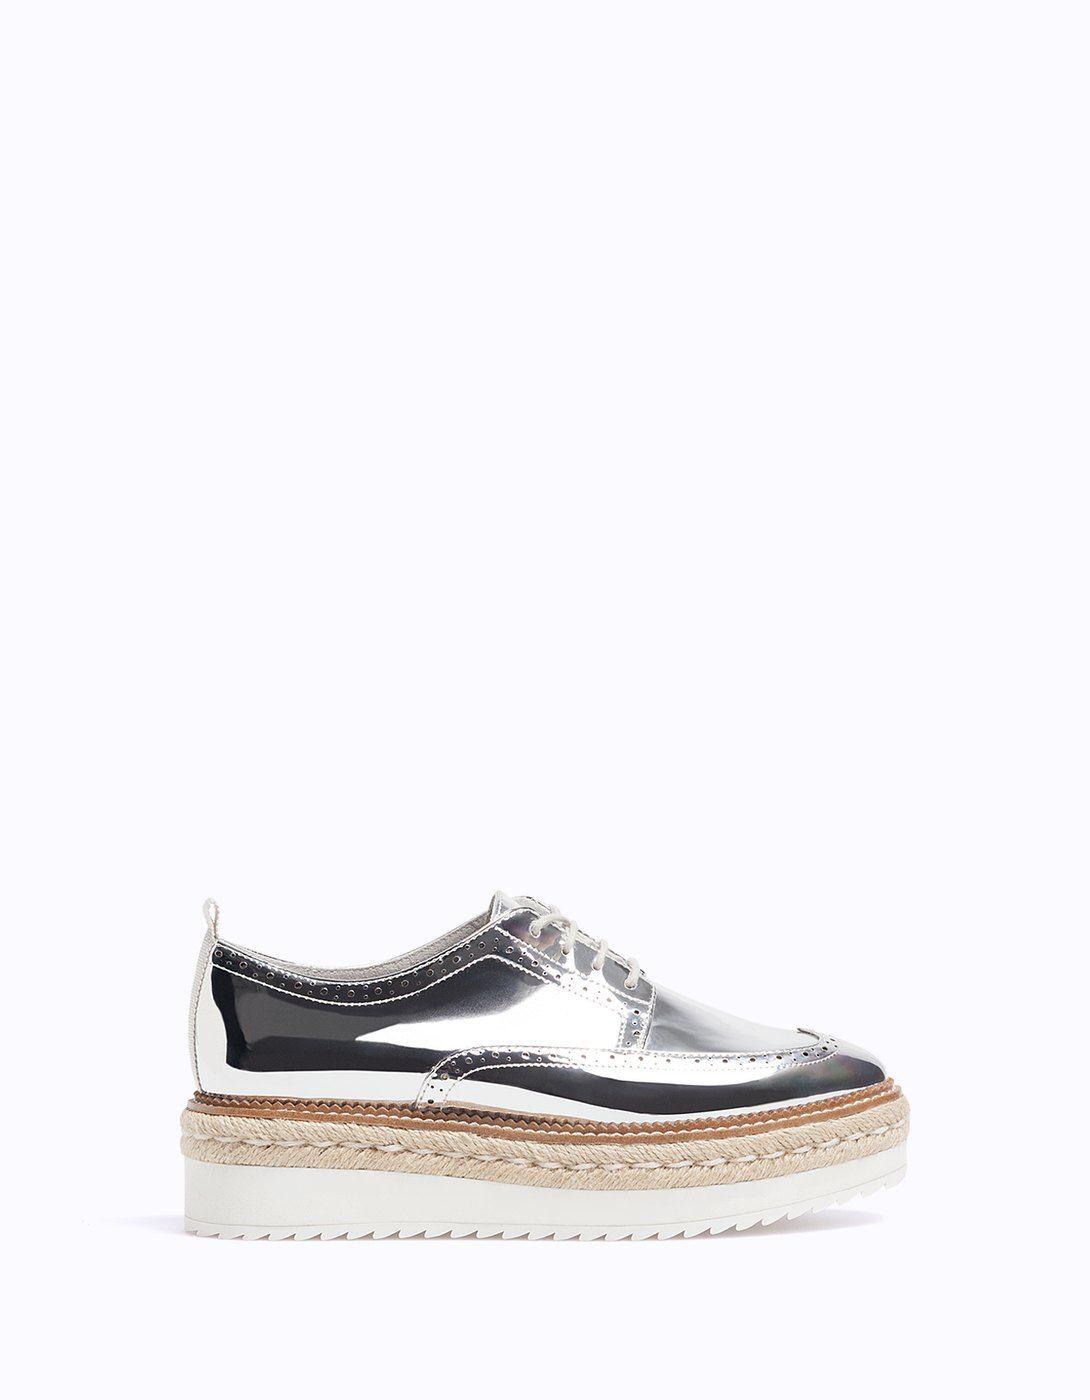 1a85abc6e51db Blucher metalizado piso yute - Zapatos